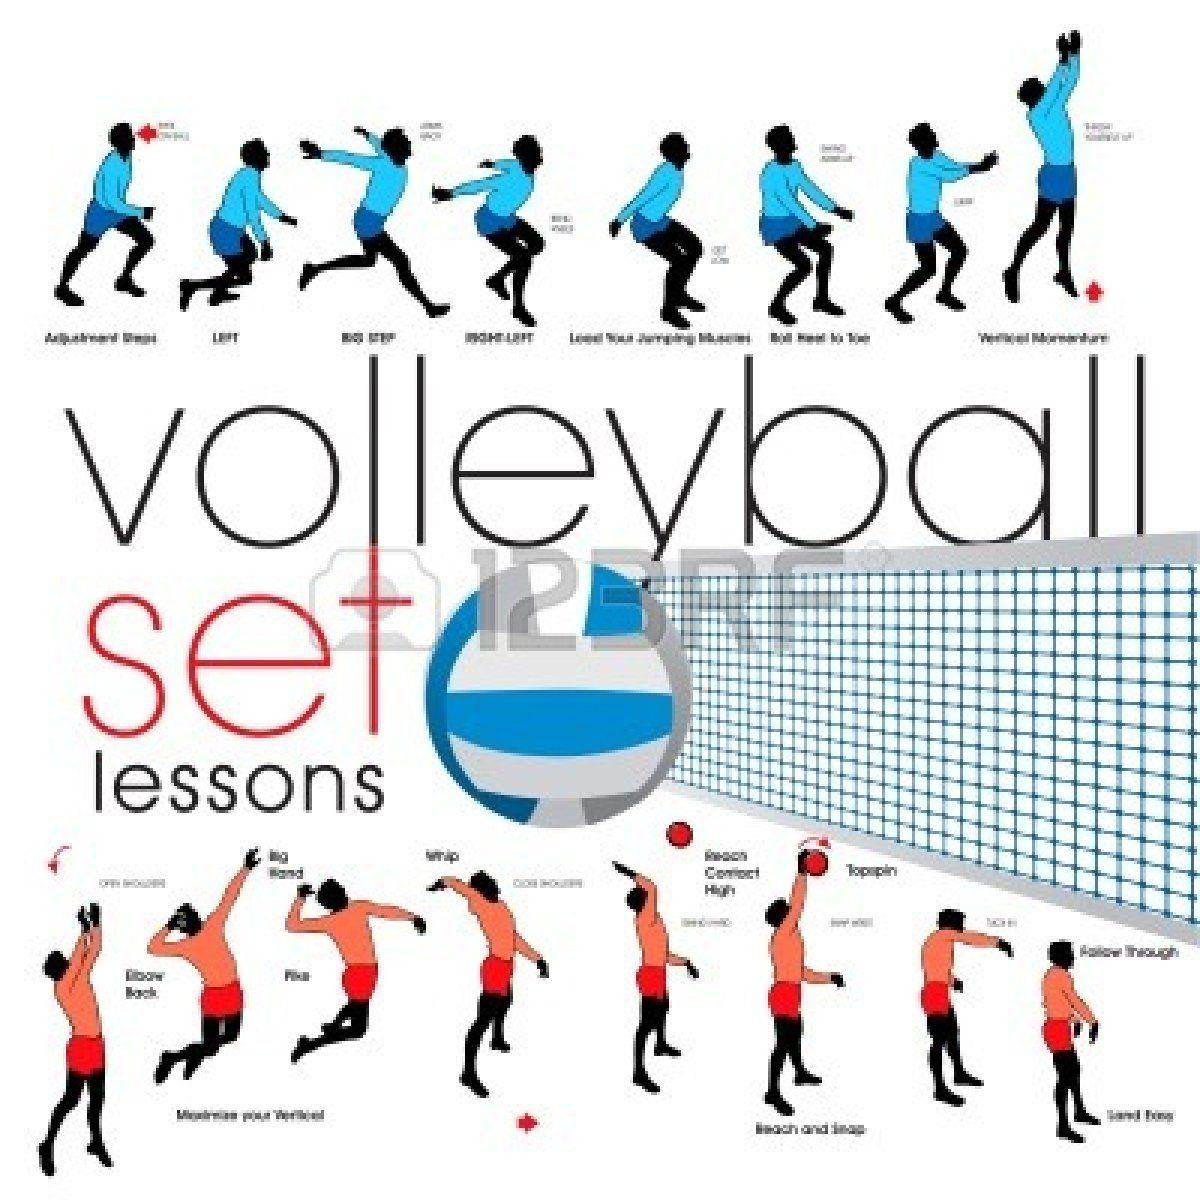 Volleyball Ball Volleyball Tryouts Volleyball Drills Volleyball Skills